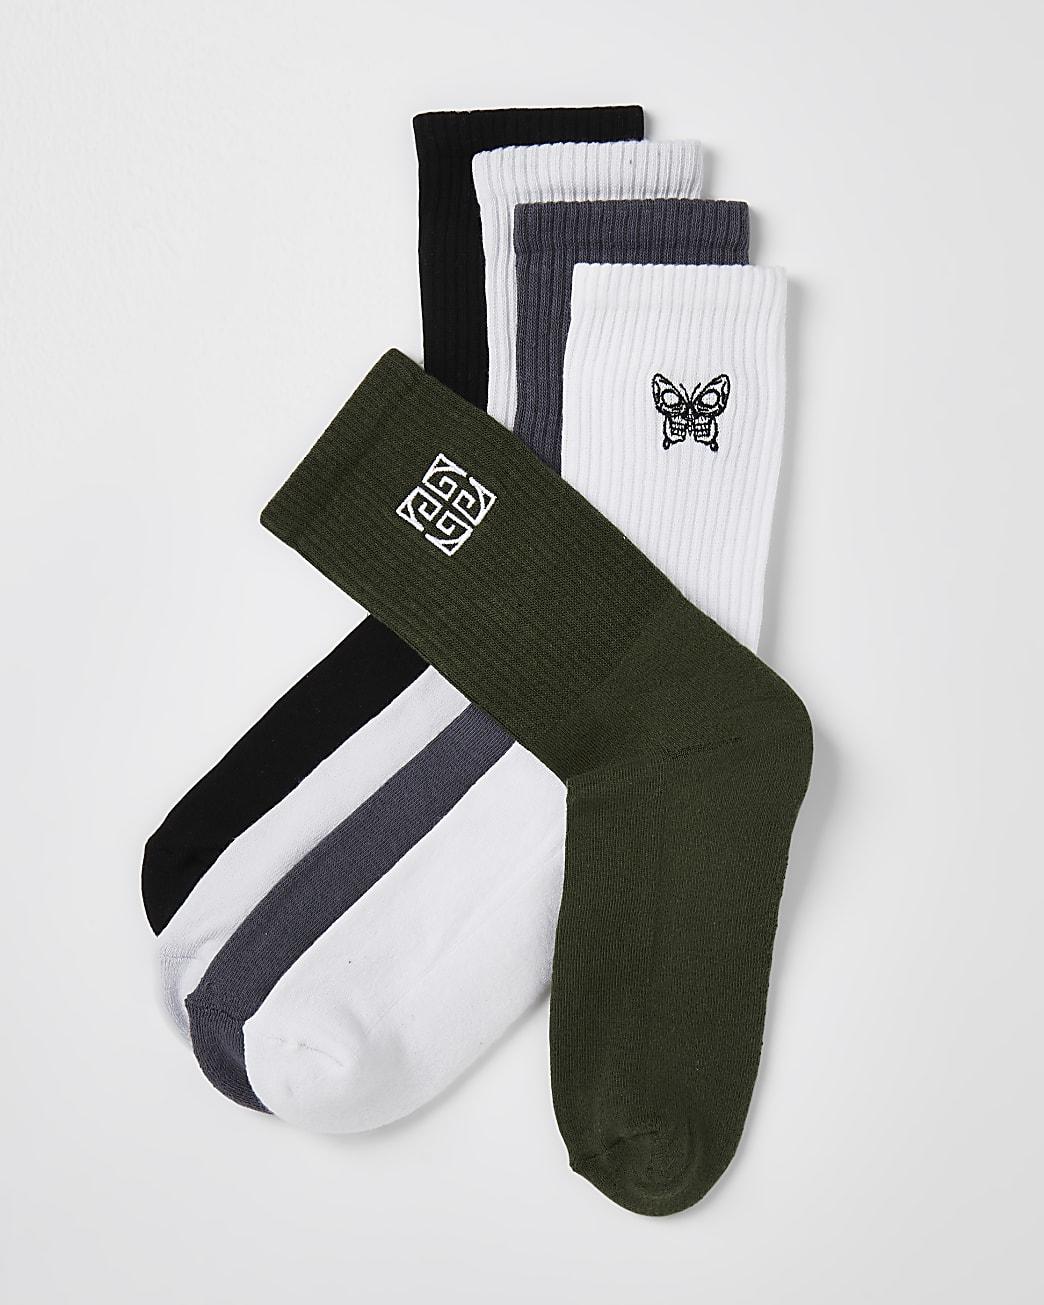 Khaki & white Greek socks 5 pack